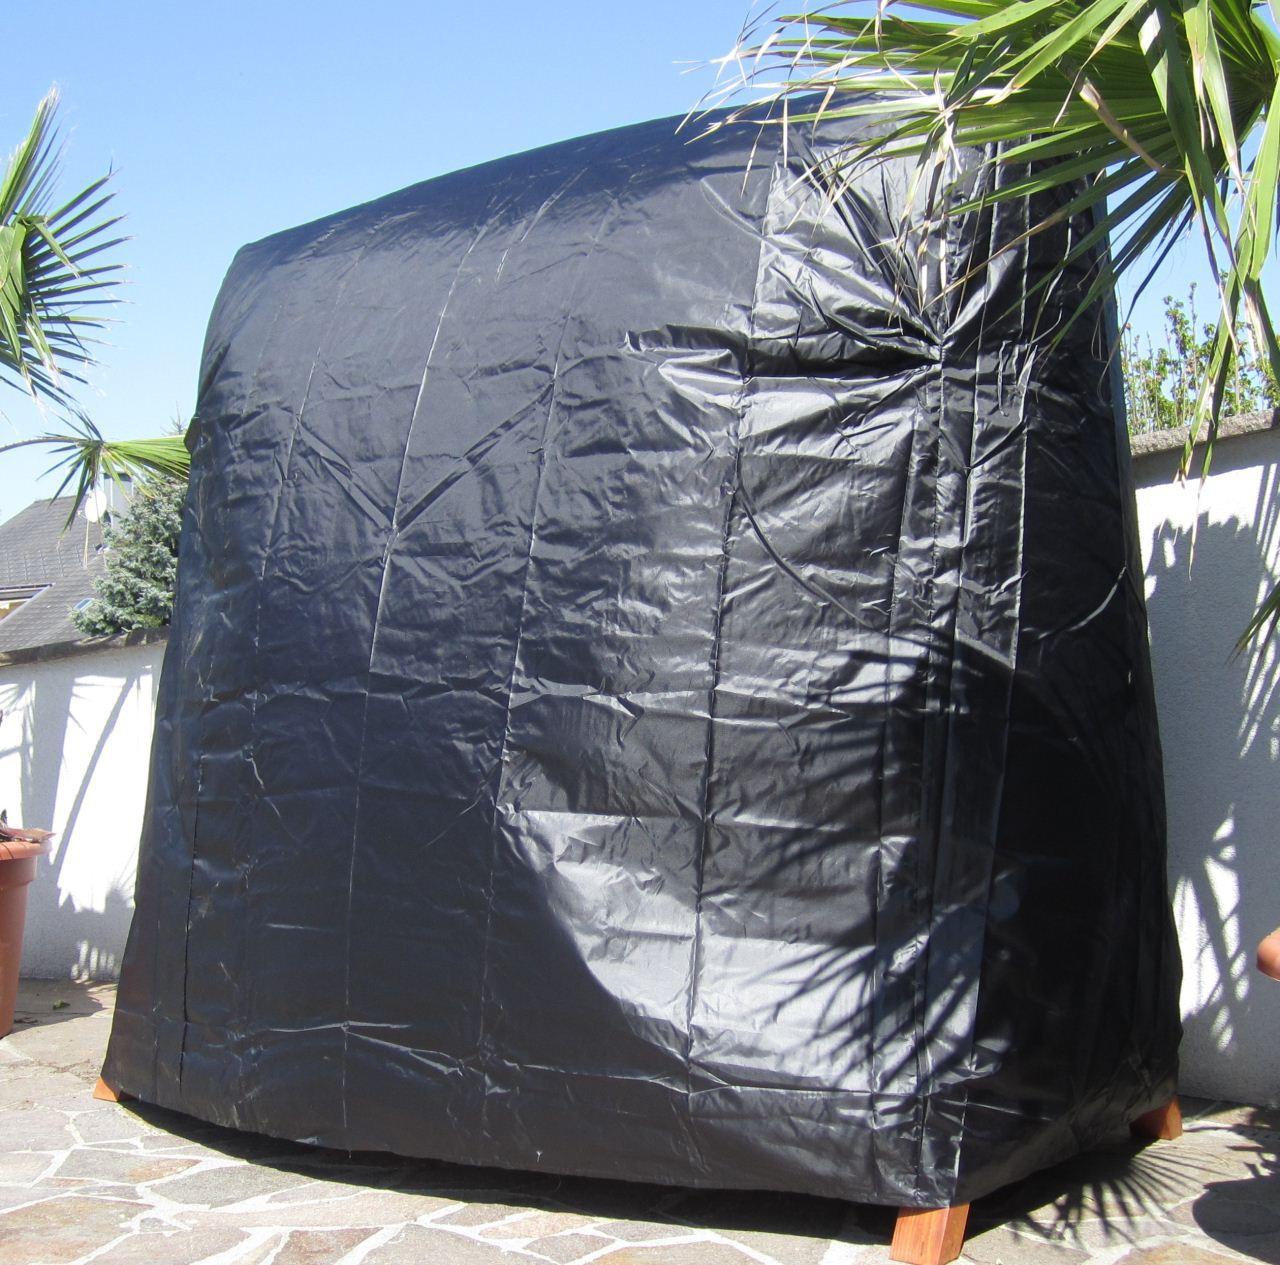 regenschutz f r hollywoodschaukel meru alles f r garten. Black Bedroom Furniture Sets. Home Design Ideas